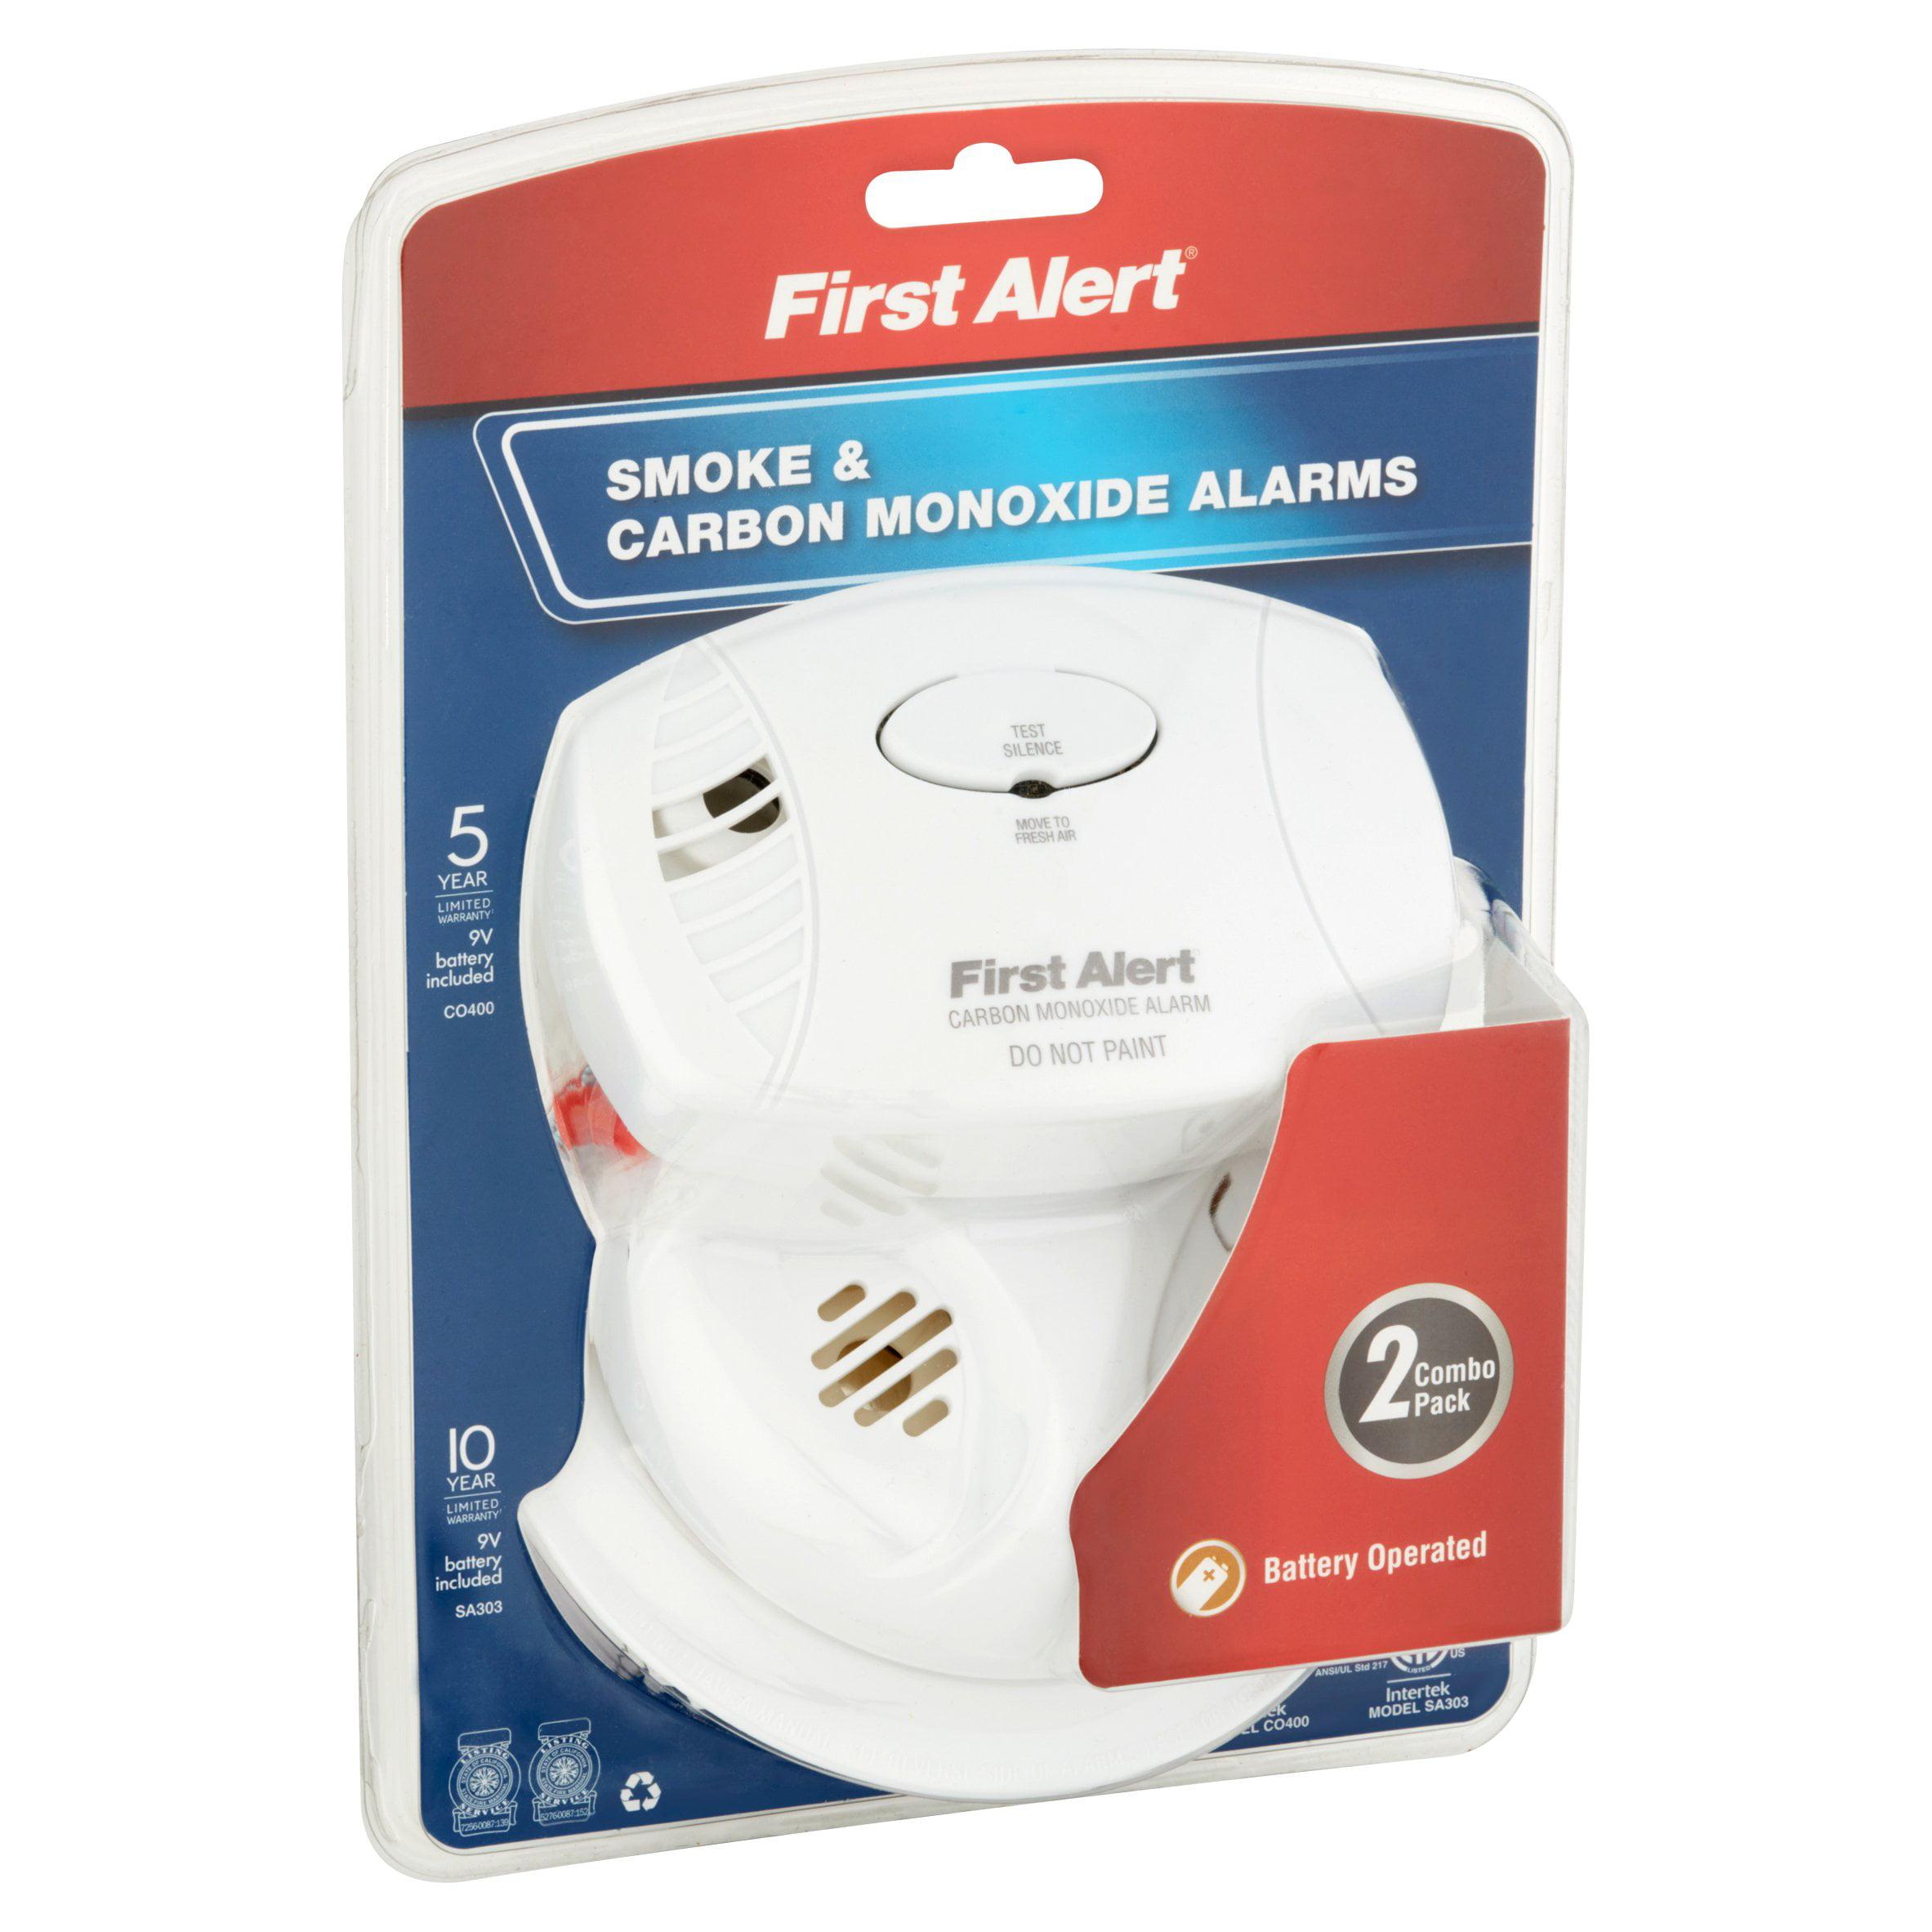 First Alert SCO403 Smoke and Carbon Monoxide Detector bo Pack Walmart